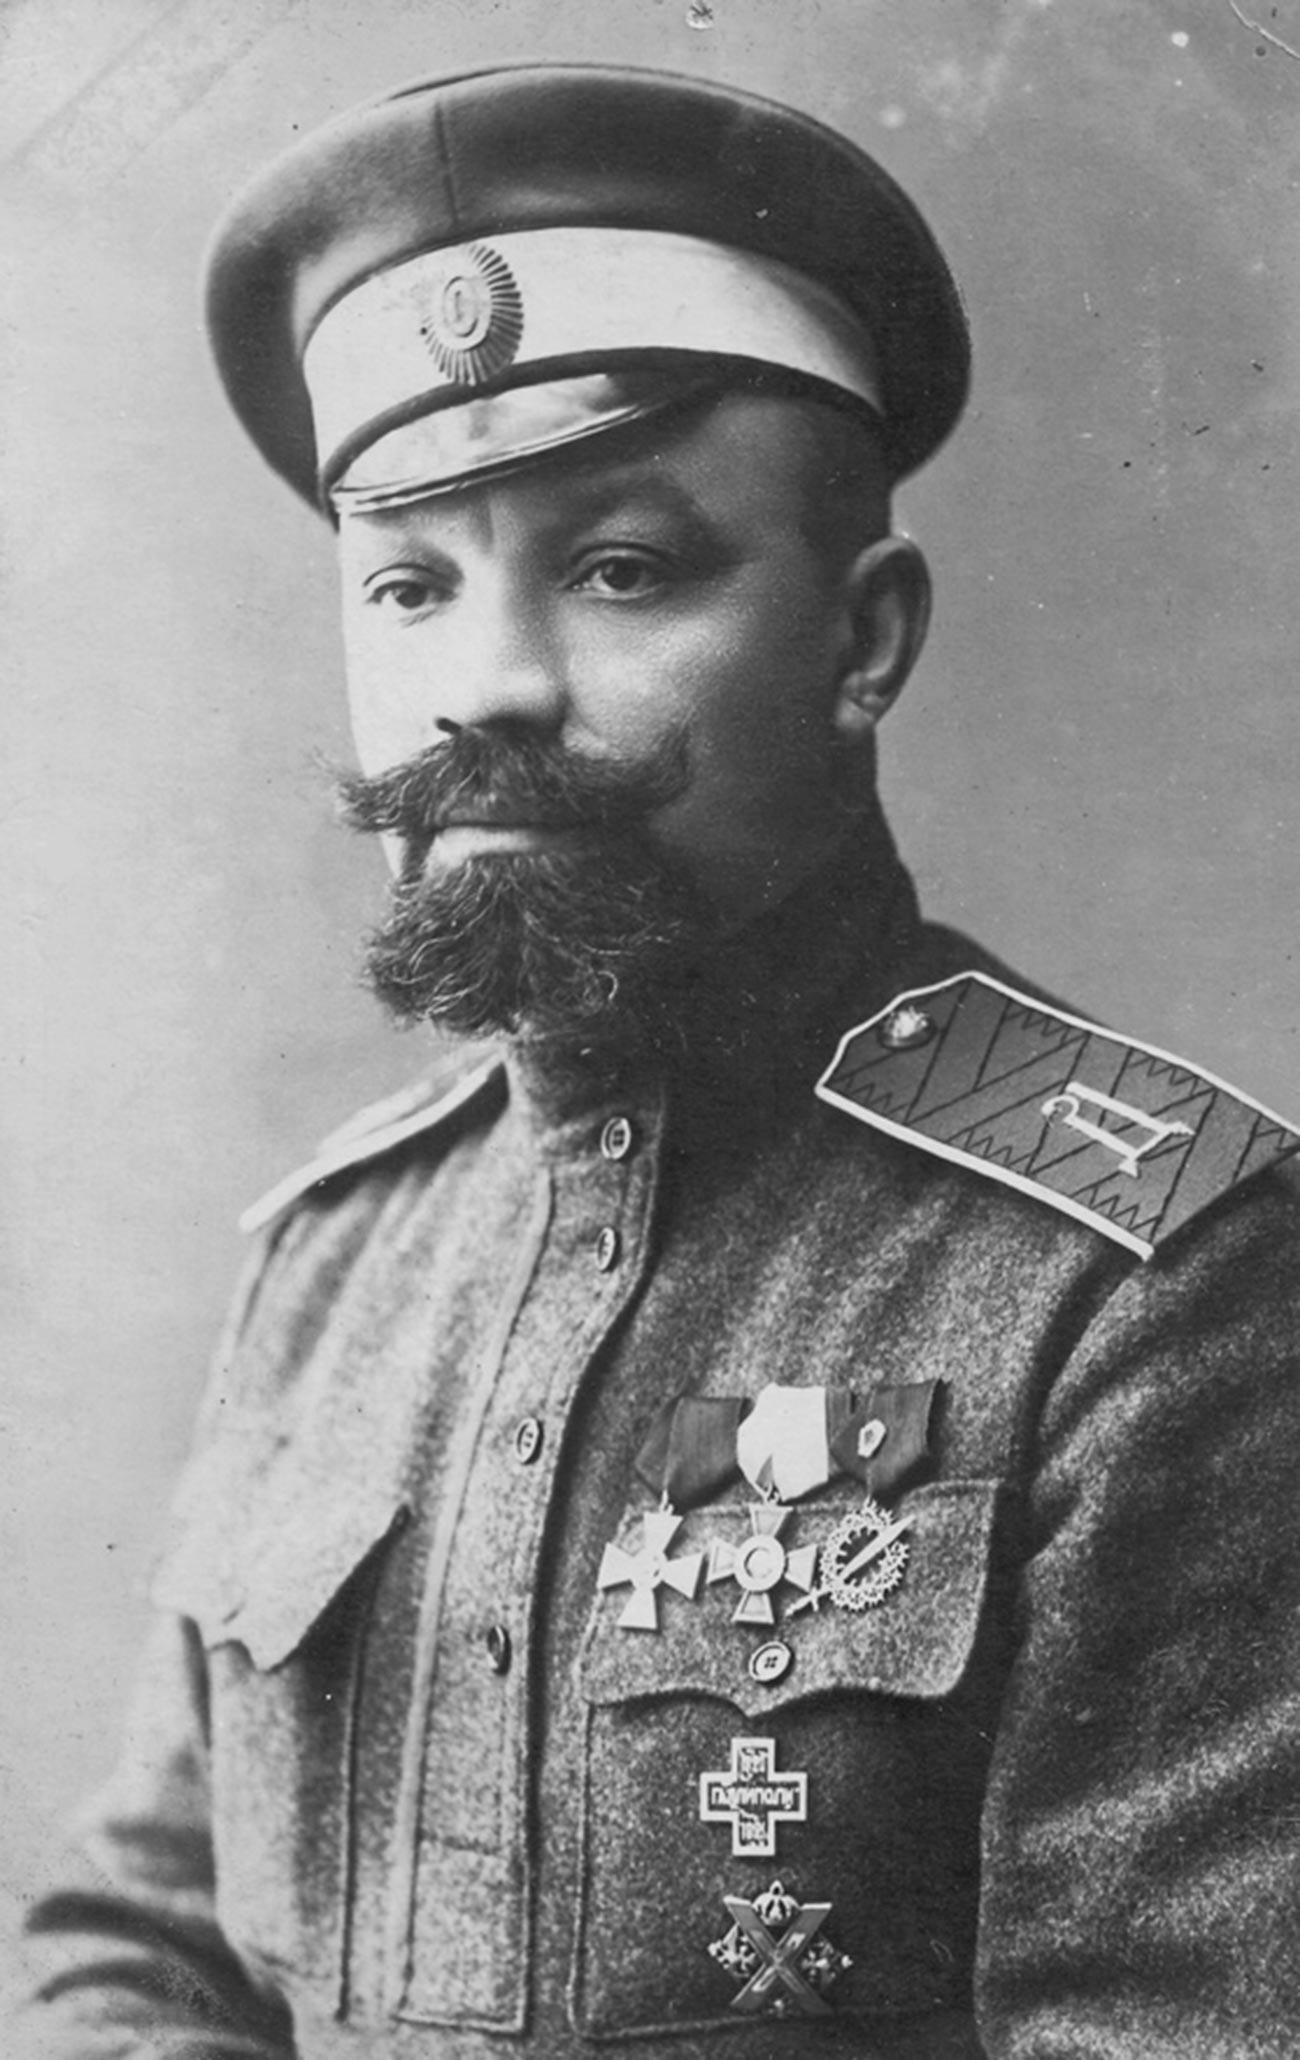 Alexander Kutepow